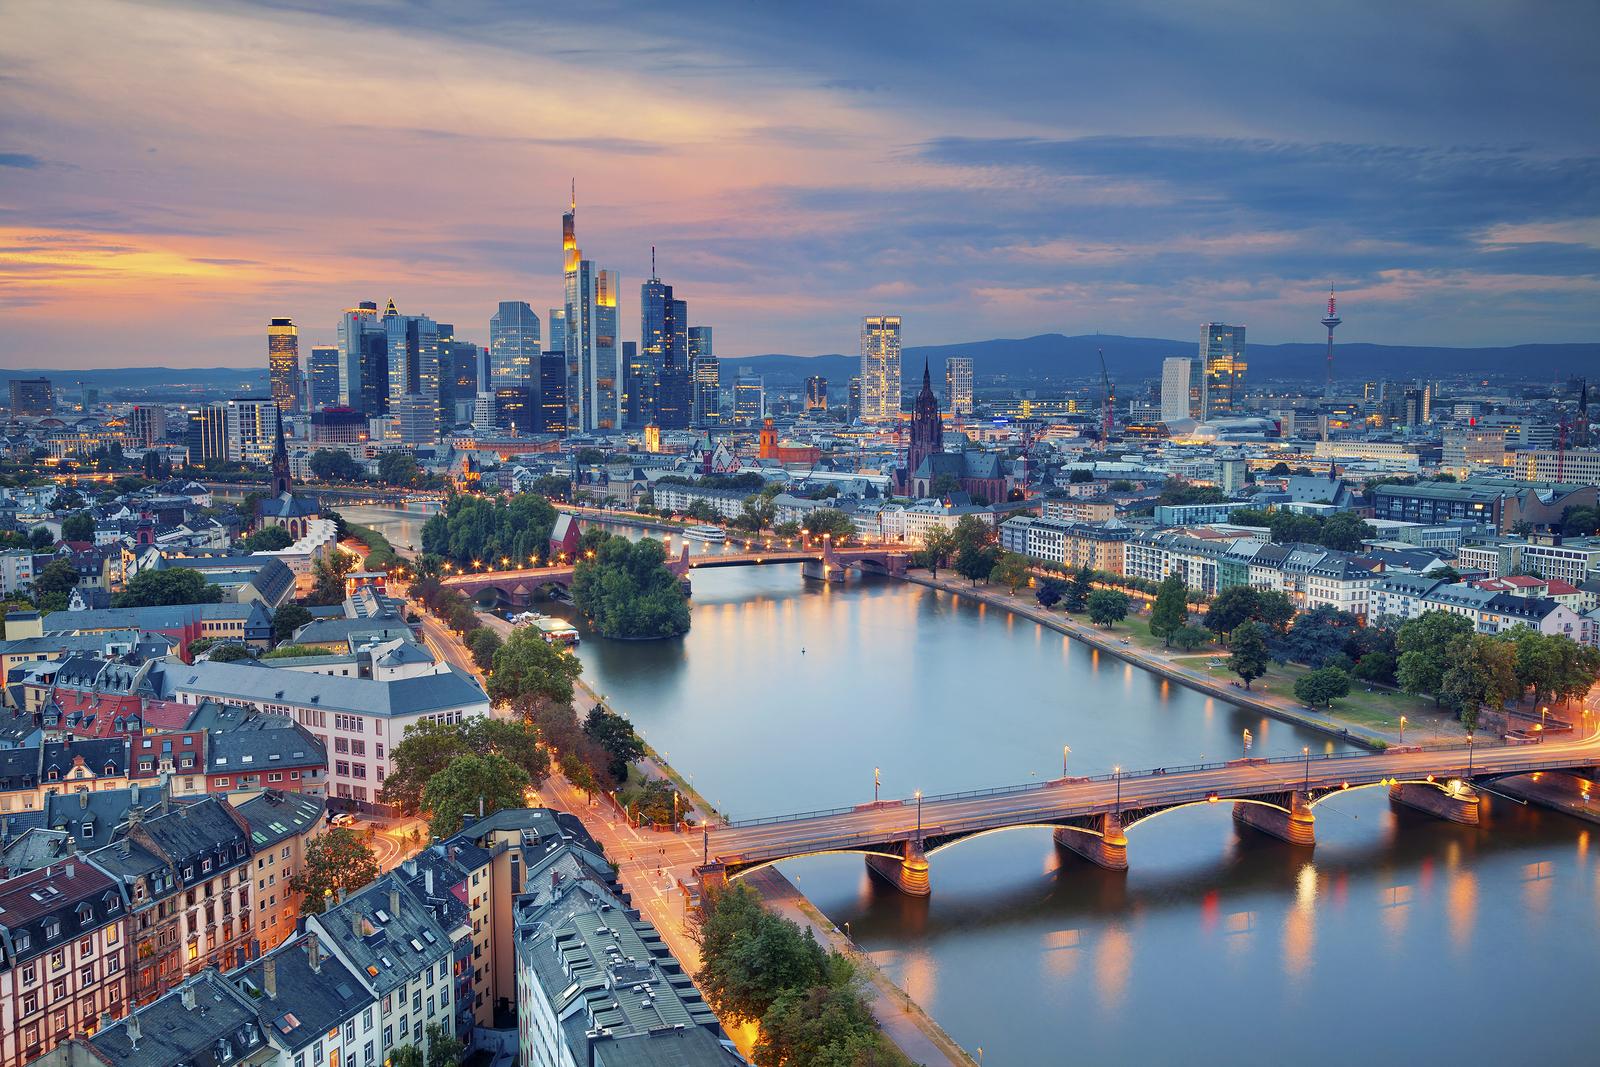 Frankfurt am Main. Image of Frankfurt am Main skyline during twilight blue hour.